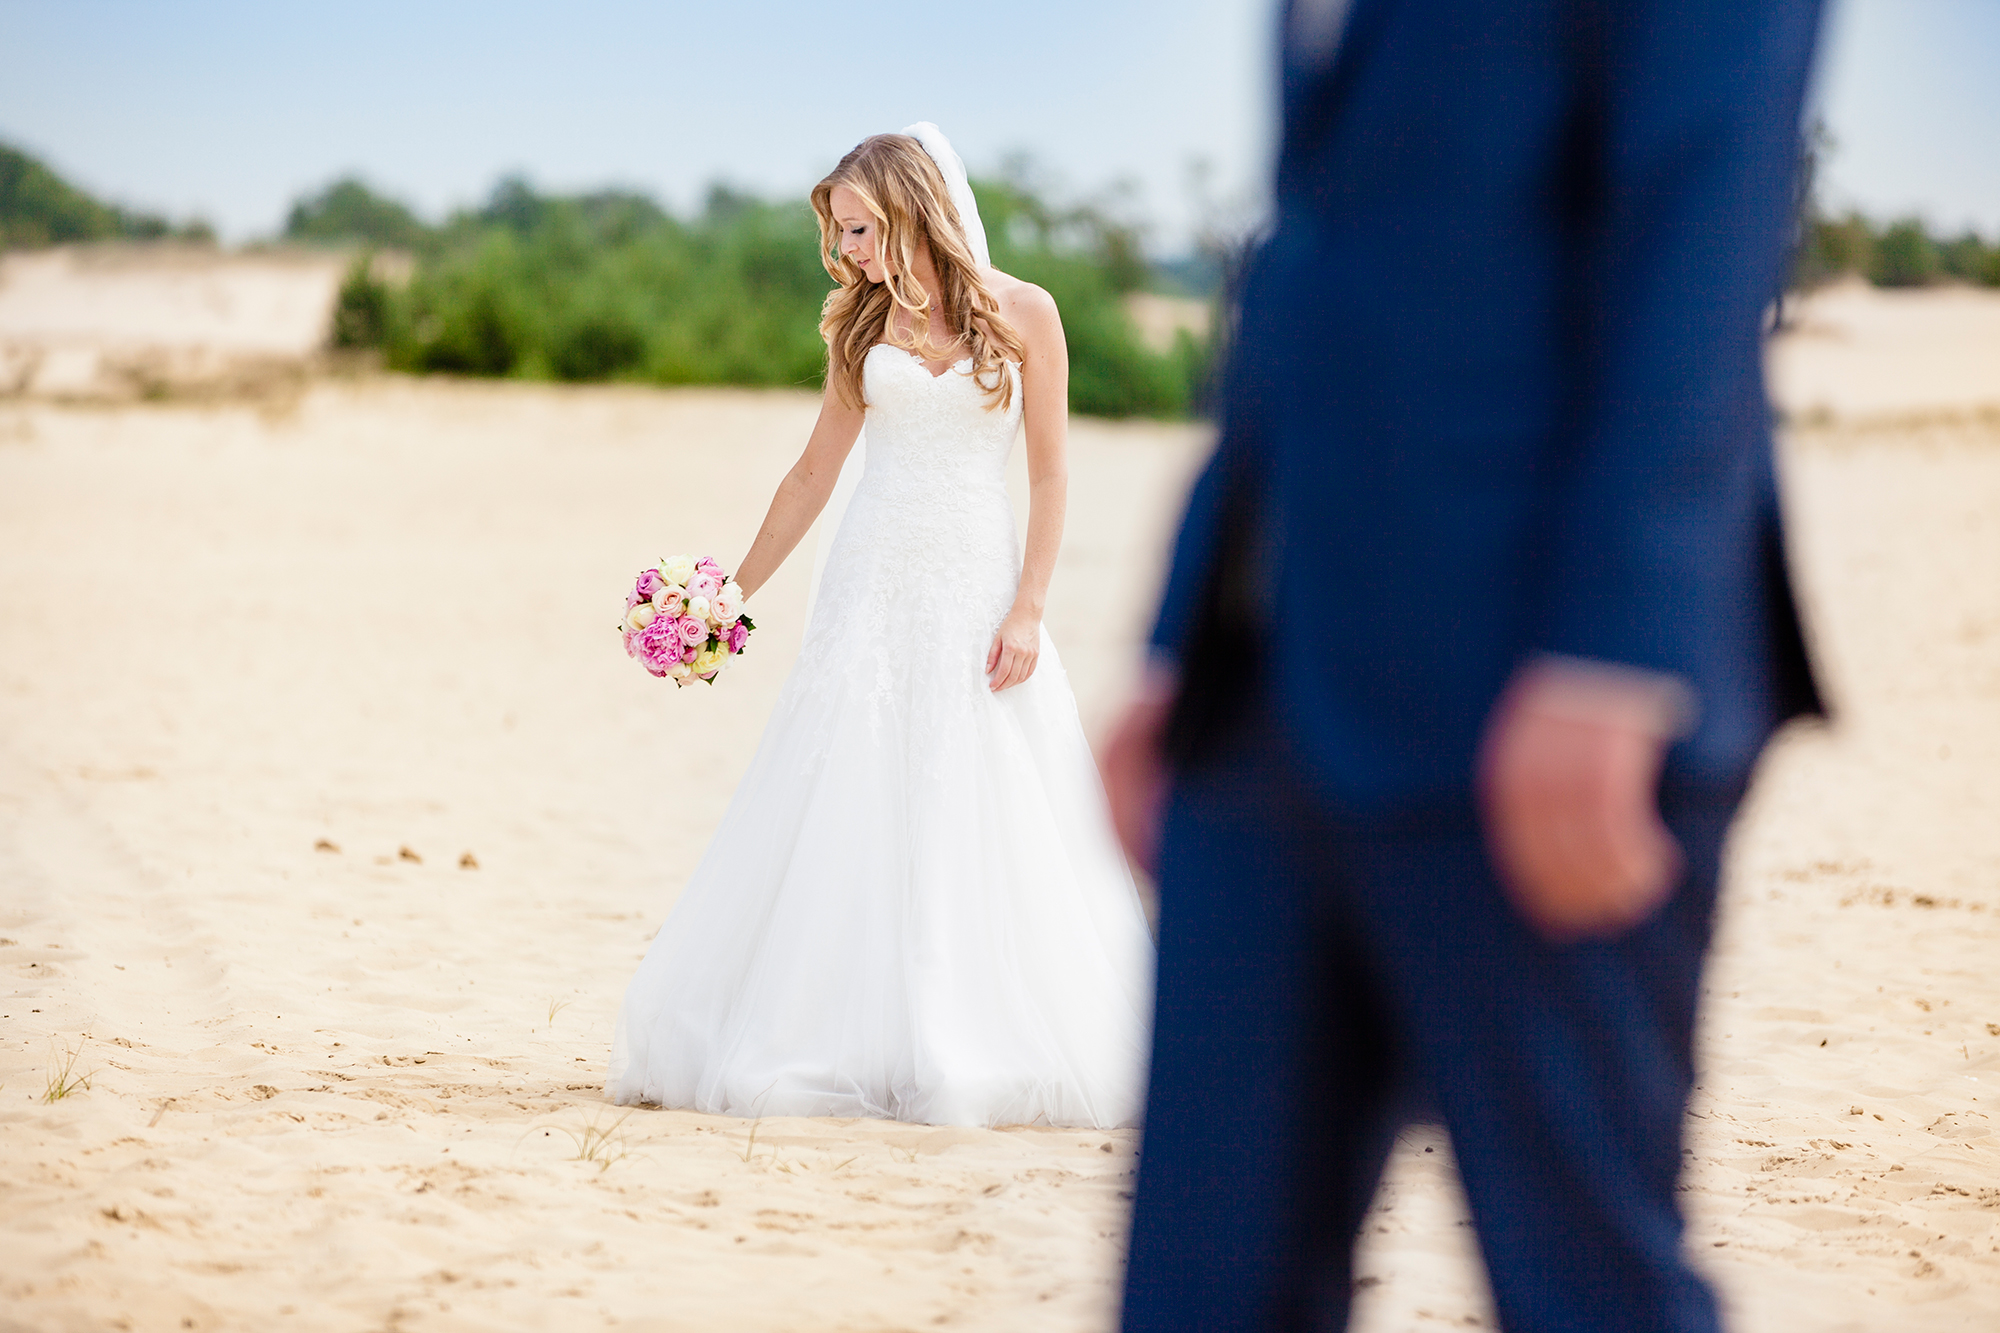 Bas-Driessen-Photography-Bart-Linda-bruidsfotografie